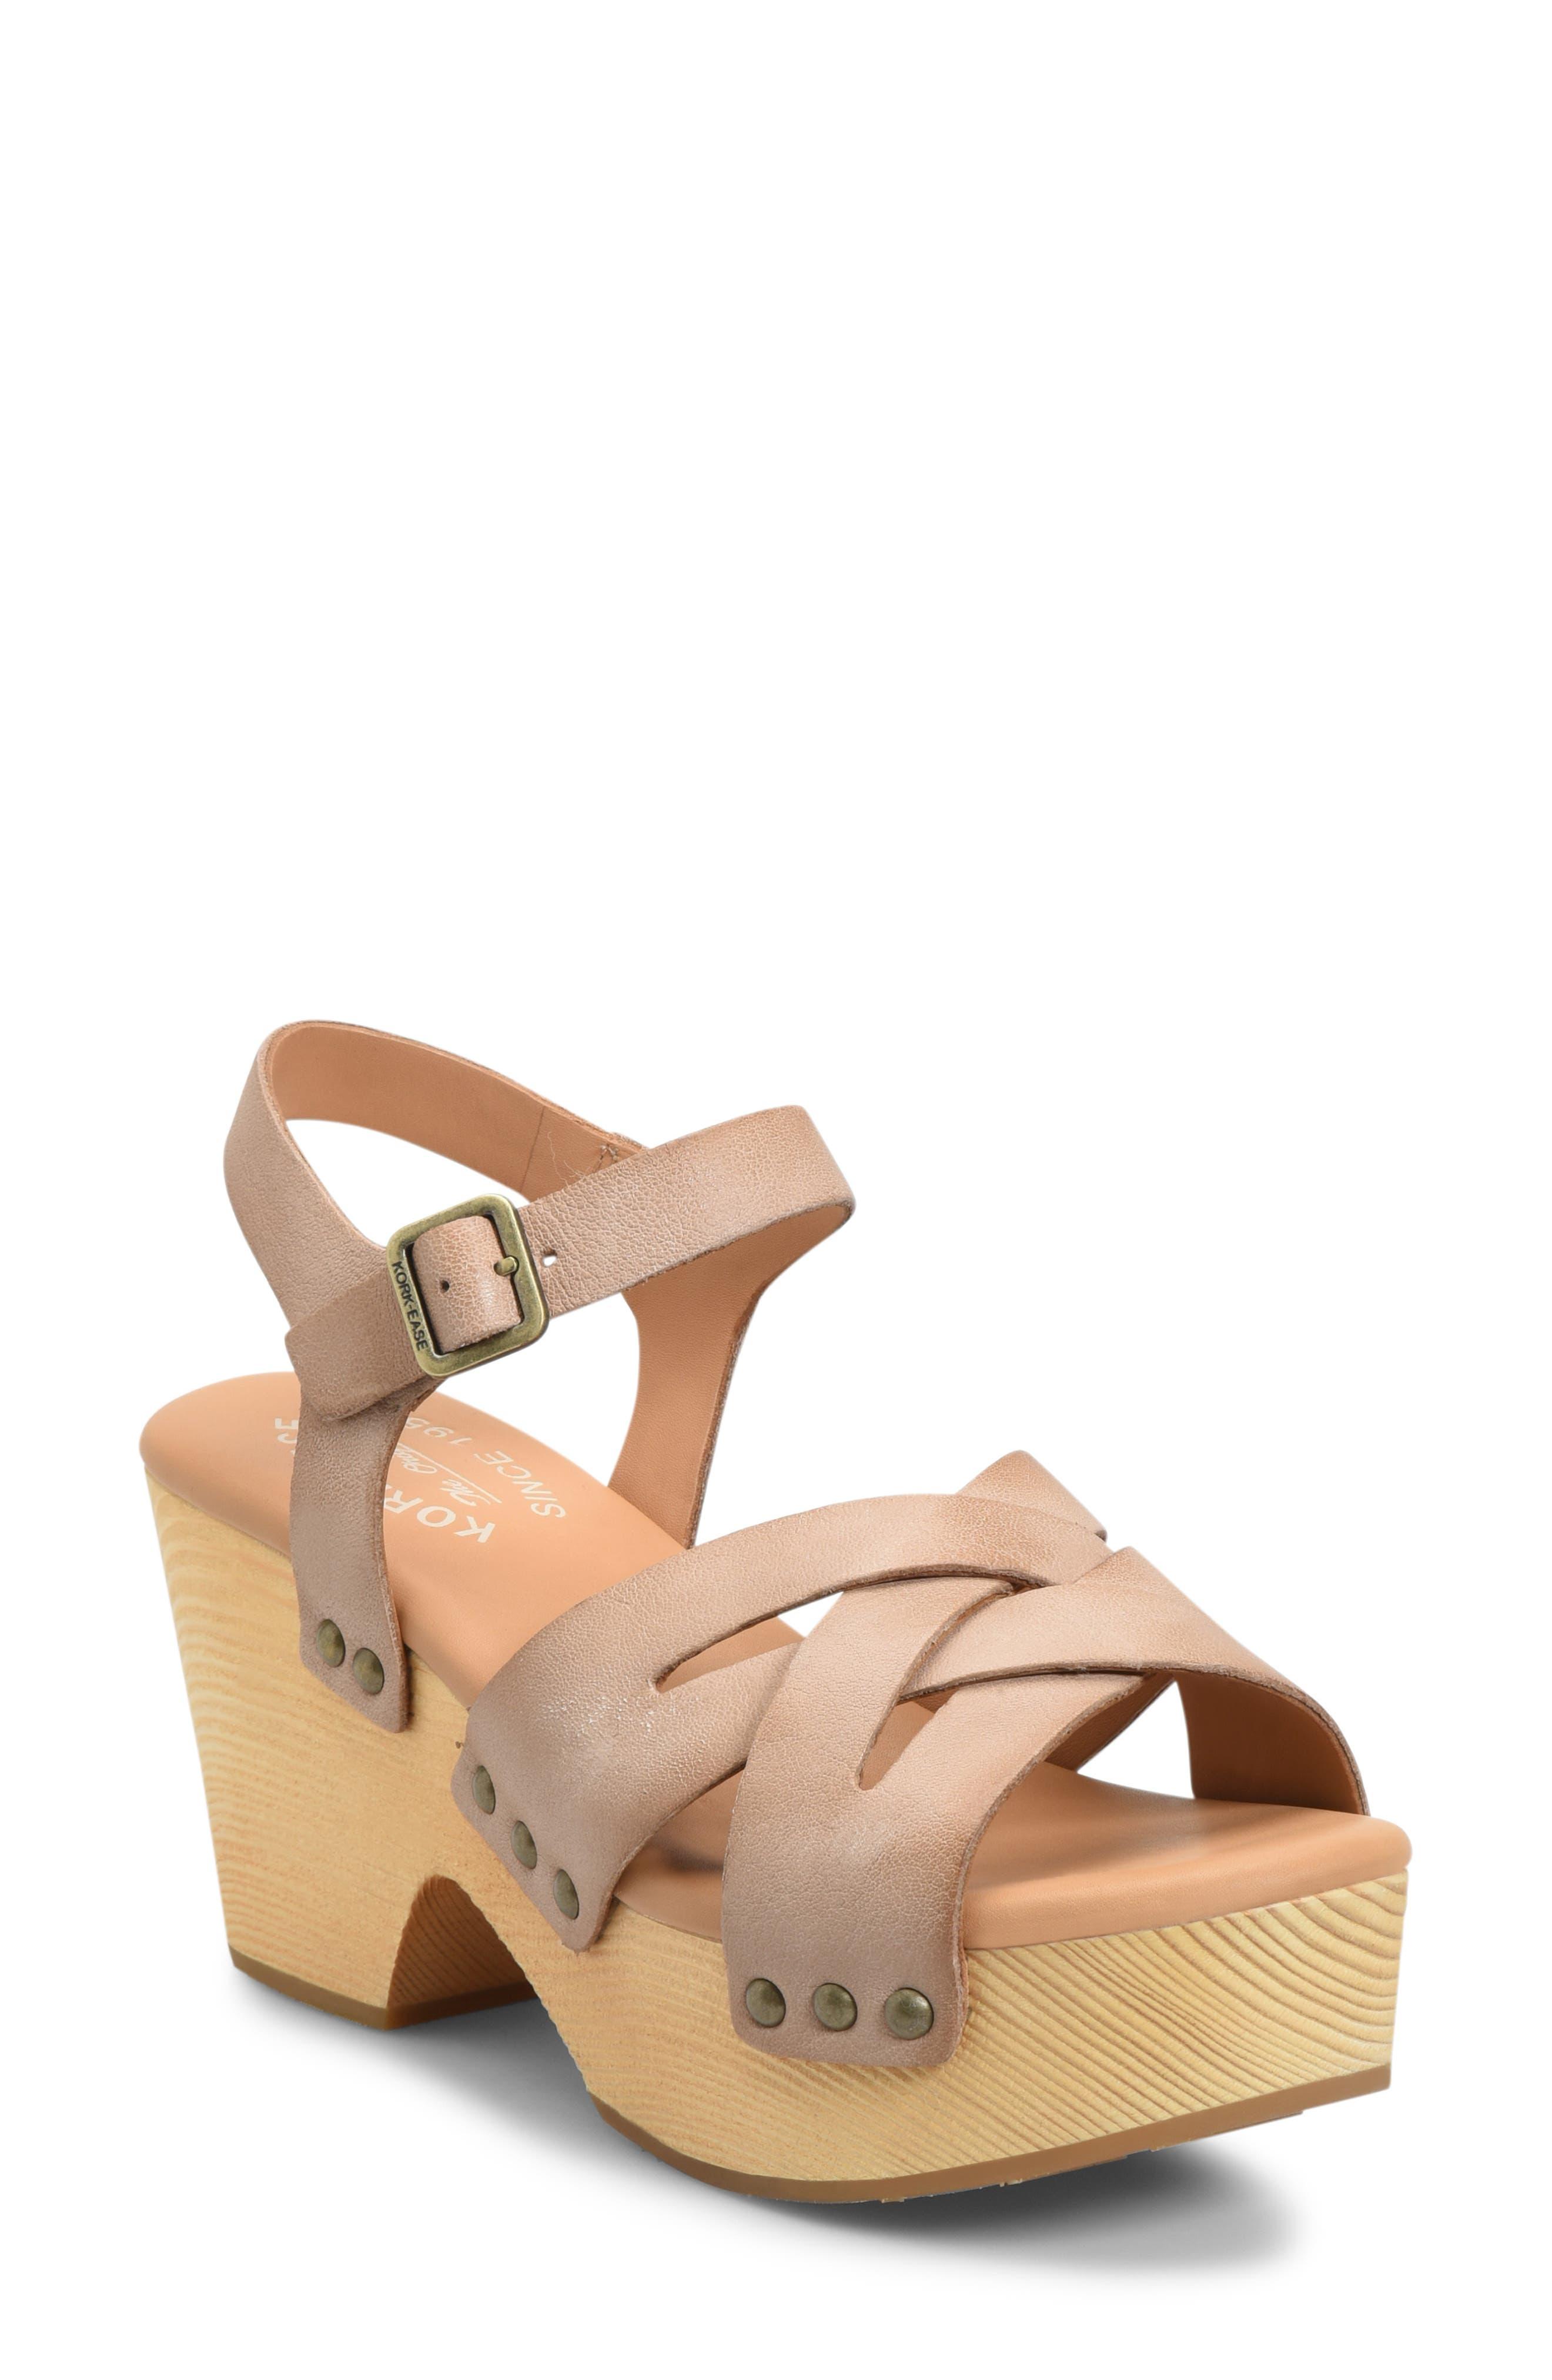 Kork high heels